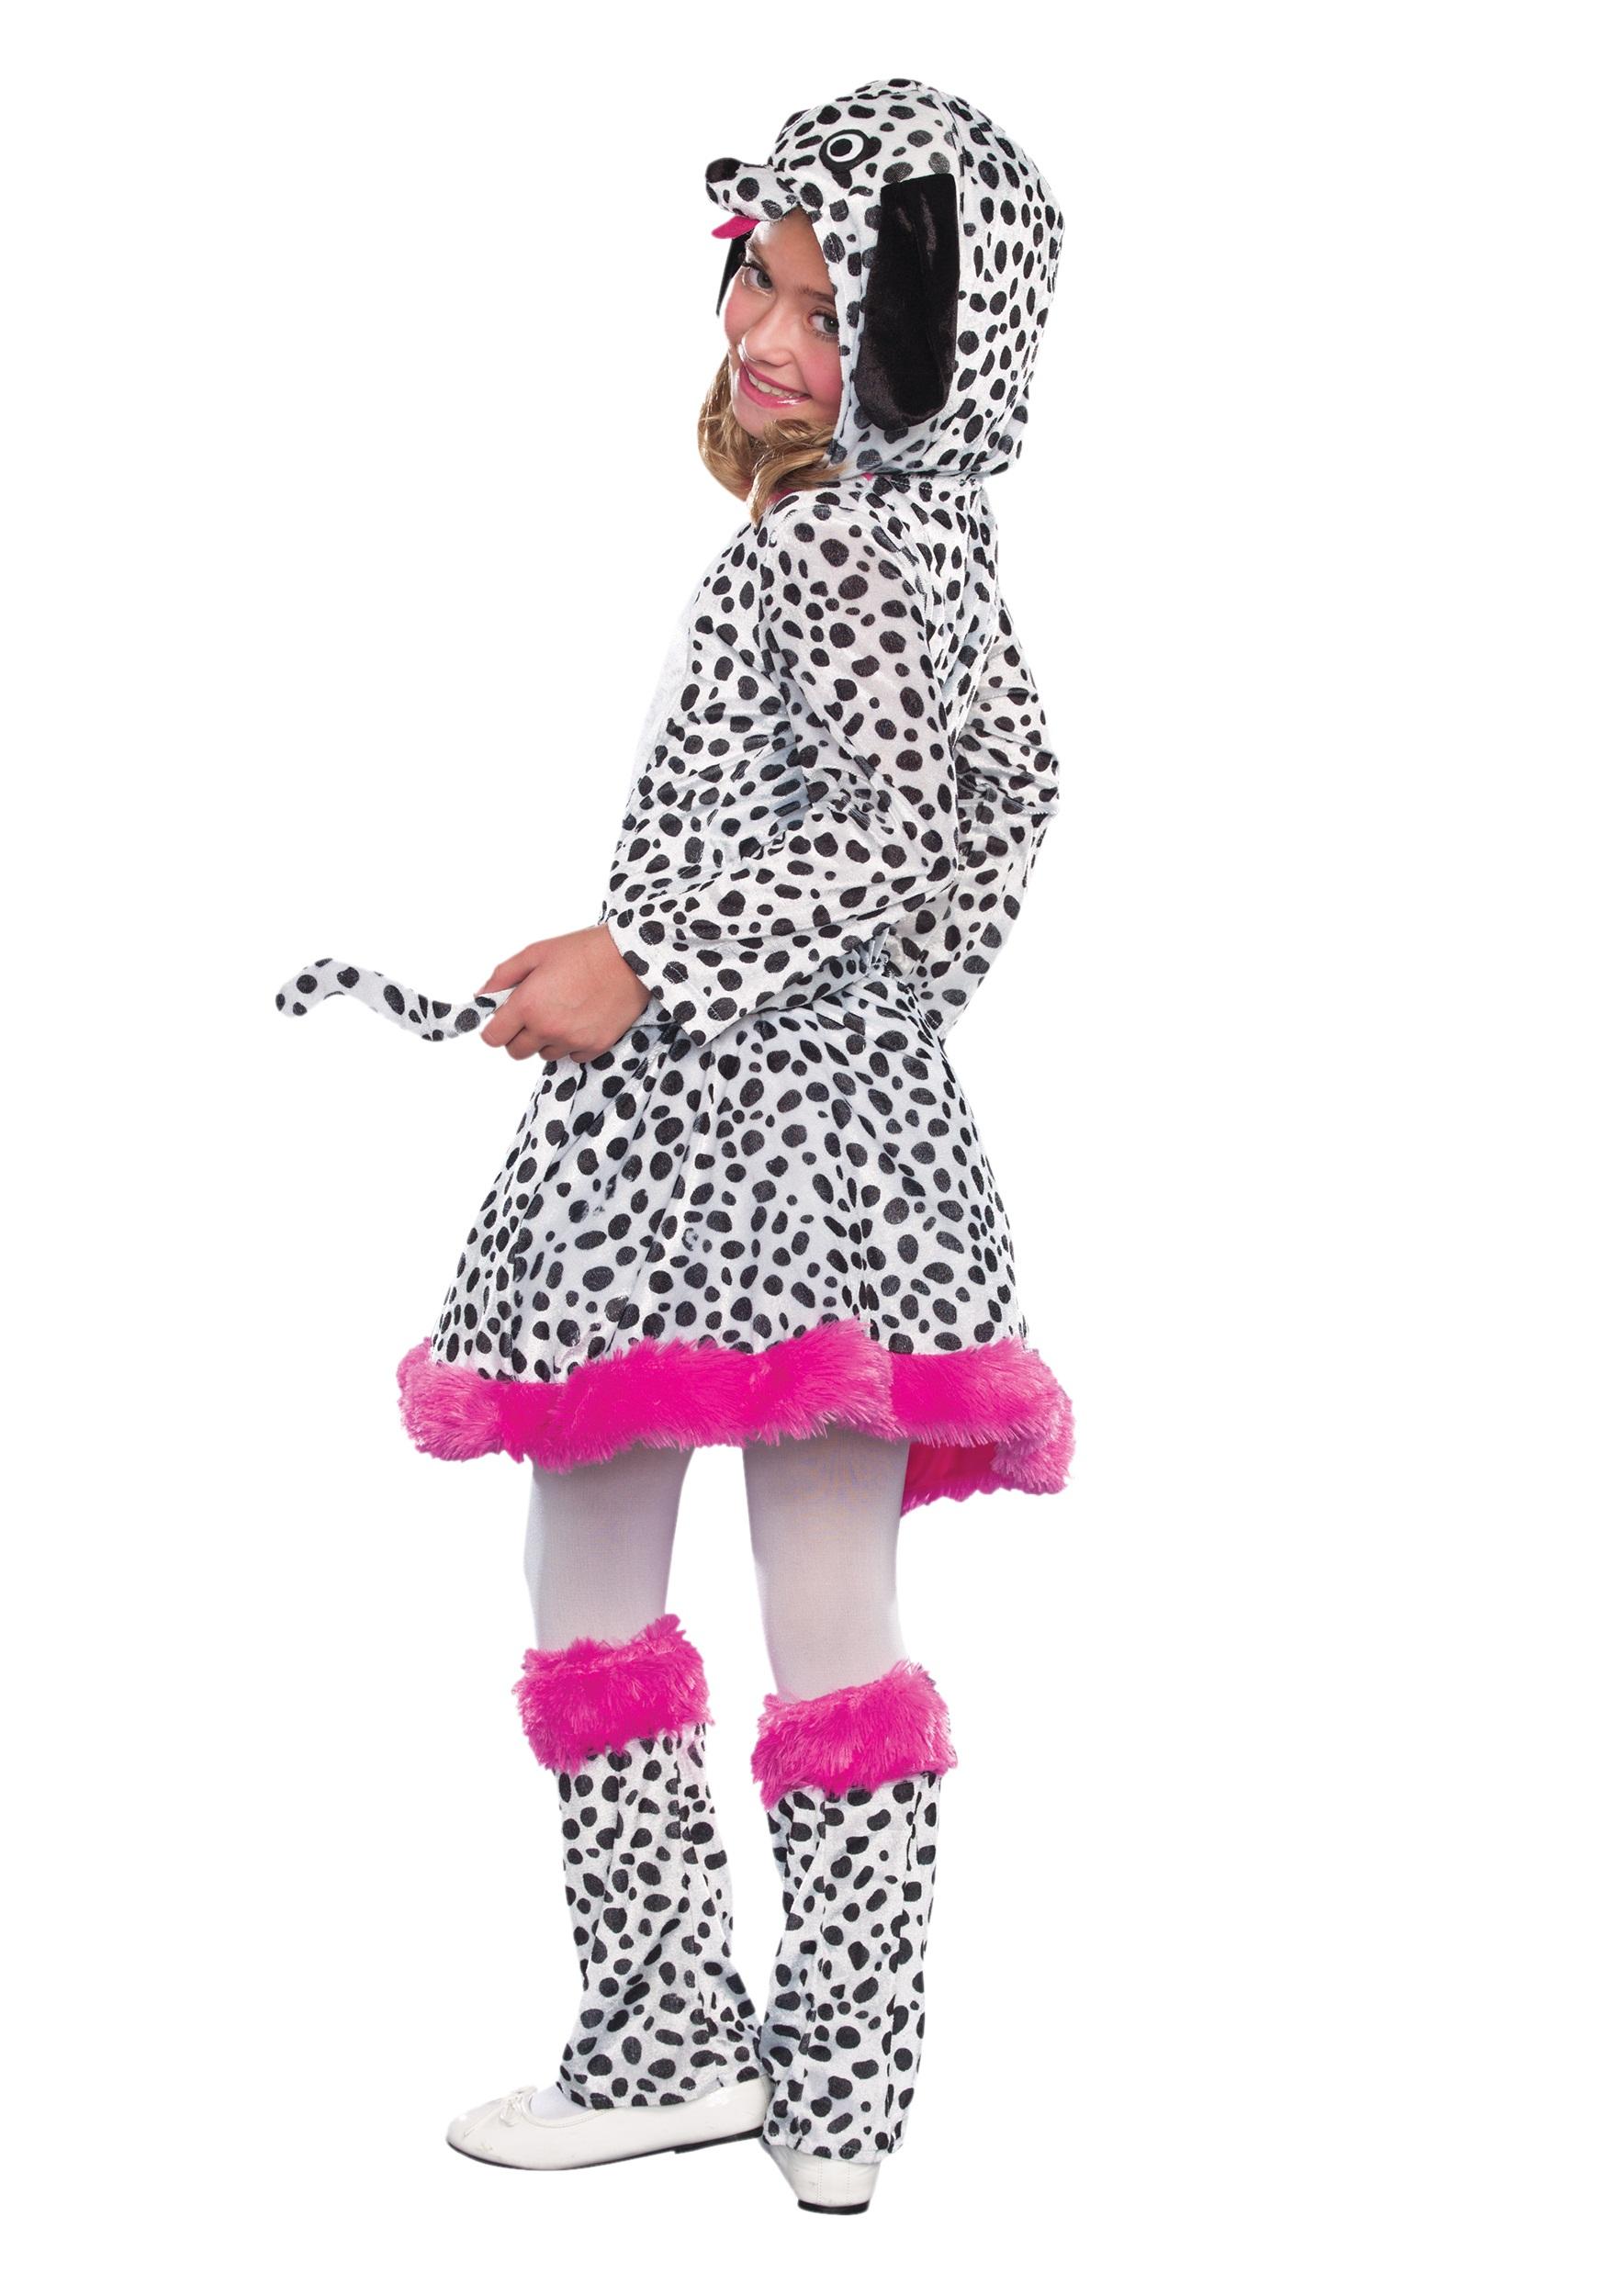 Girls Dalmatian Costume Girls Dalmatian Costume Alt1  sc 1 st  Halloween Costumes & Girls Dalmatian Costume